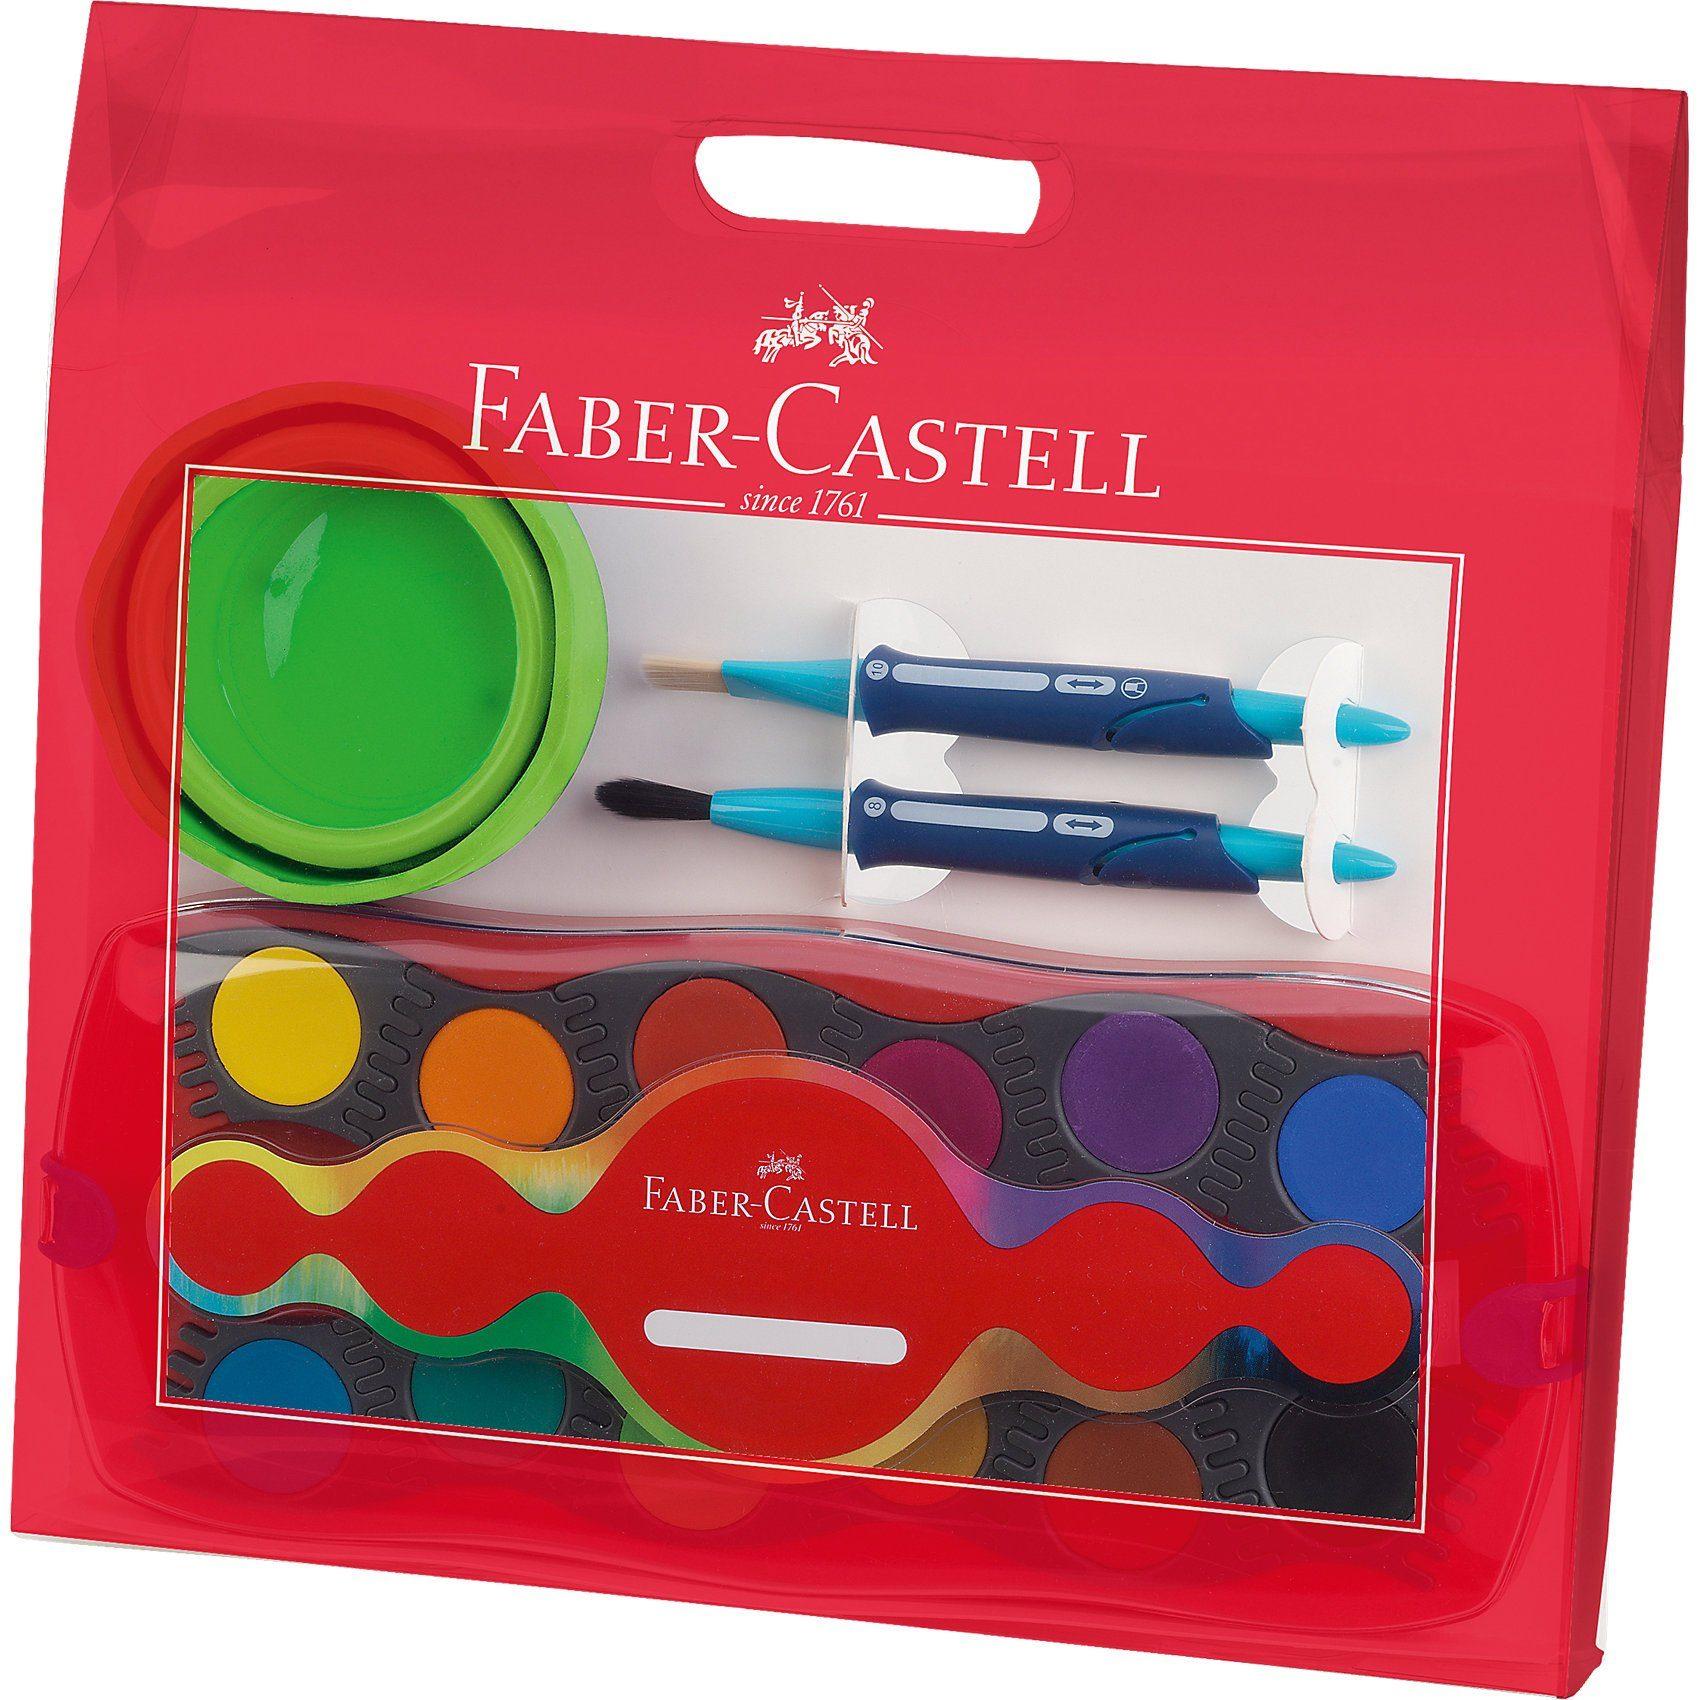 Faber-Castell CONNECTOR Malkoffer, inkl. Farbkasten, Becher & Pinsel